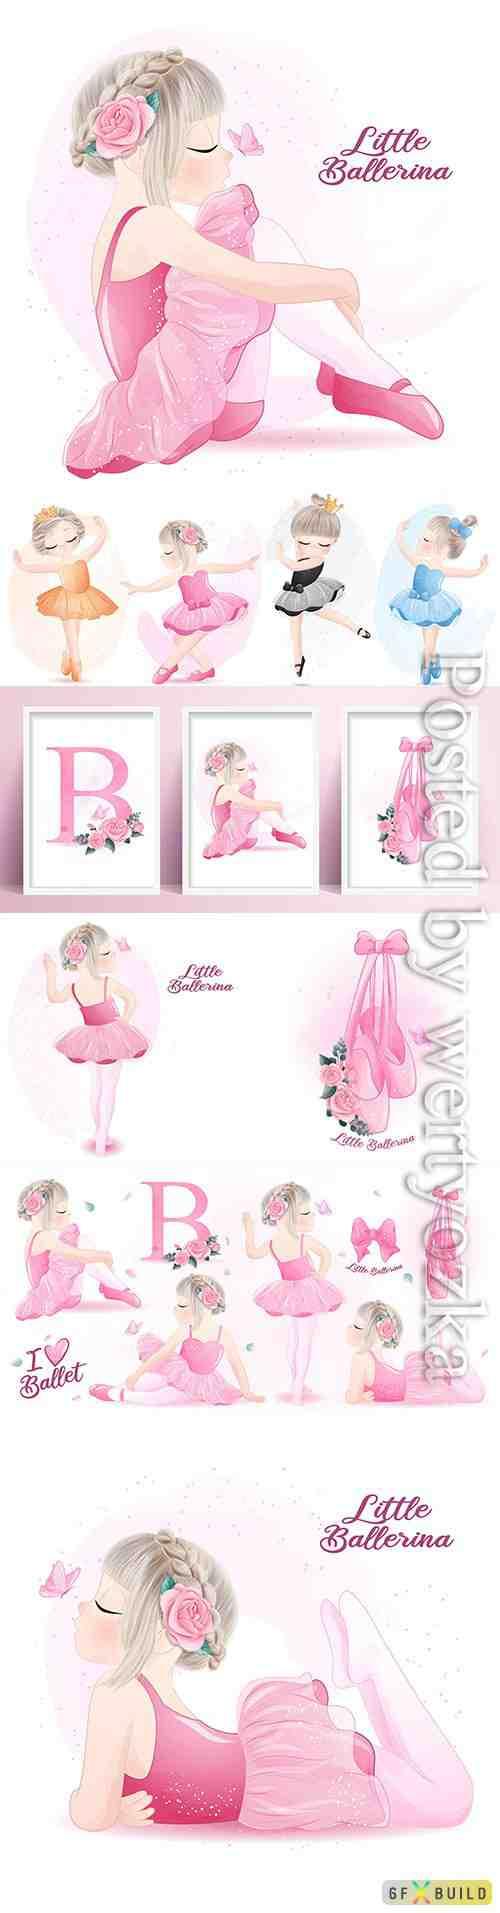 Cute girl ballerina watercolor illustration vector set